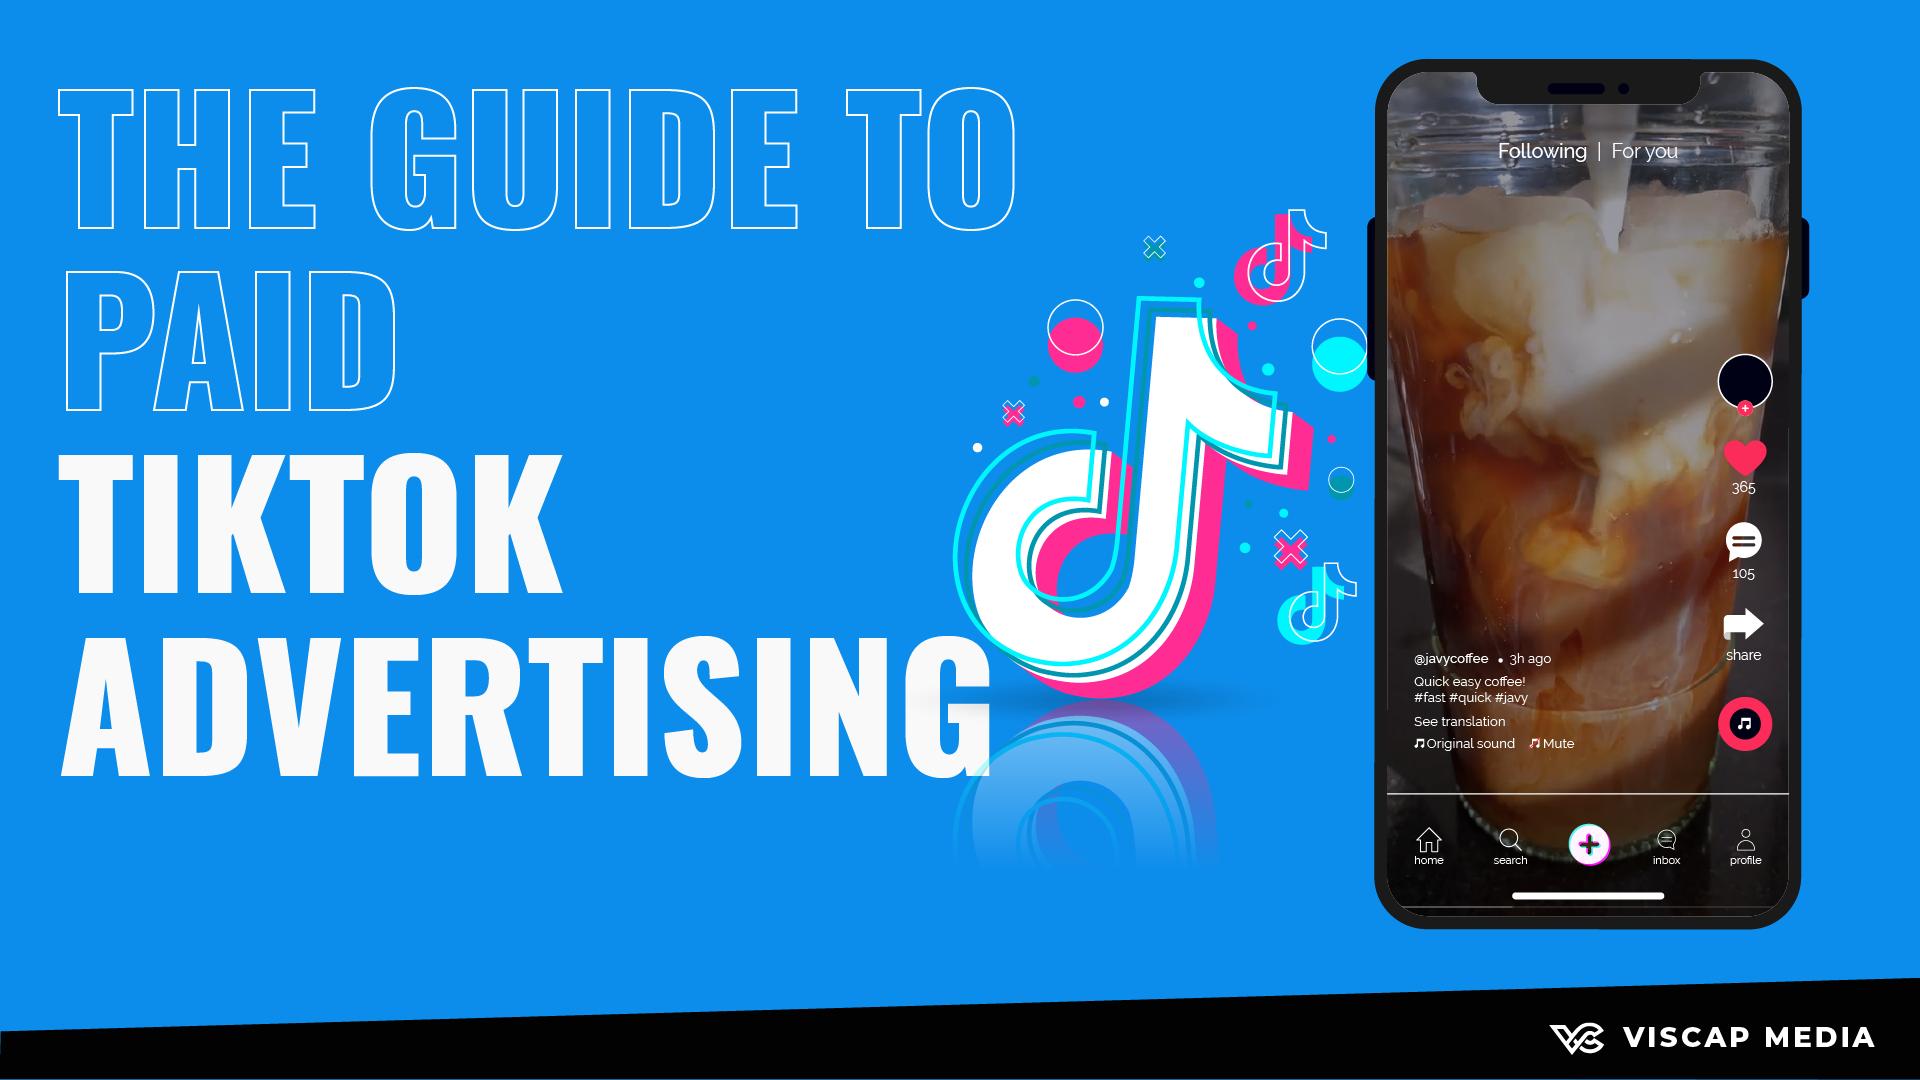 The Guide To Paid TikTok Advertising